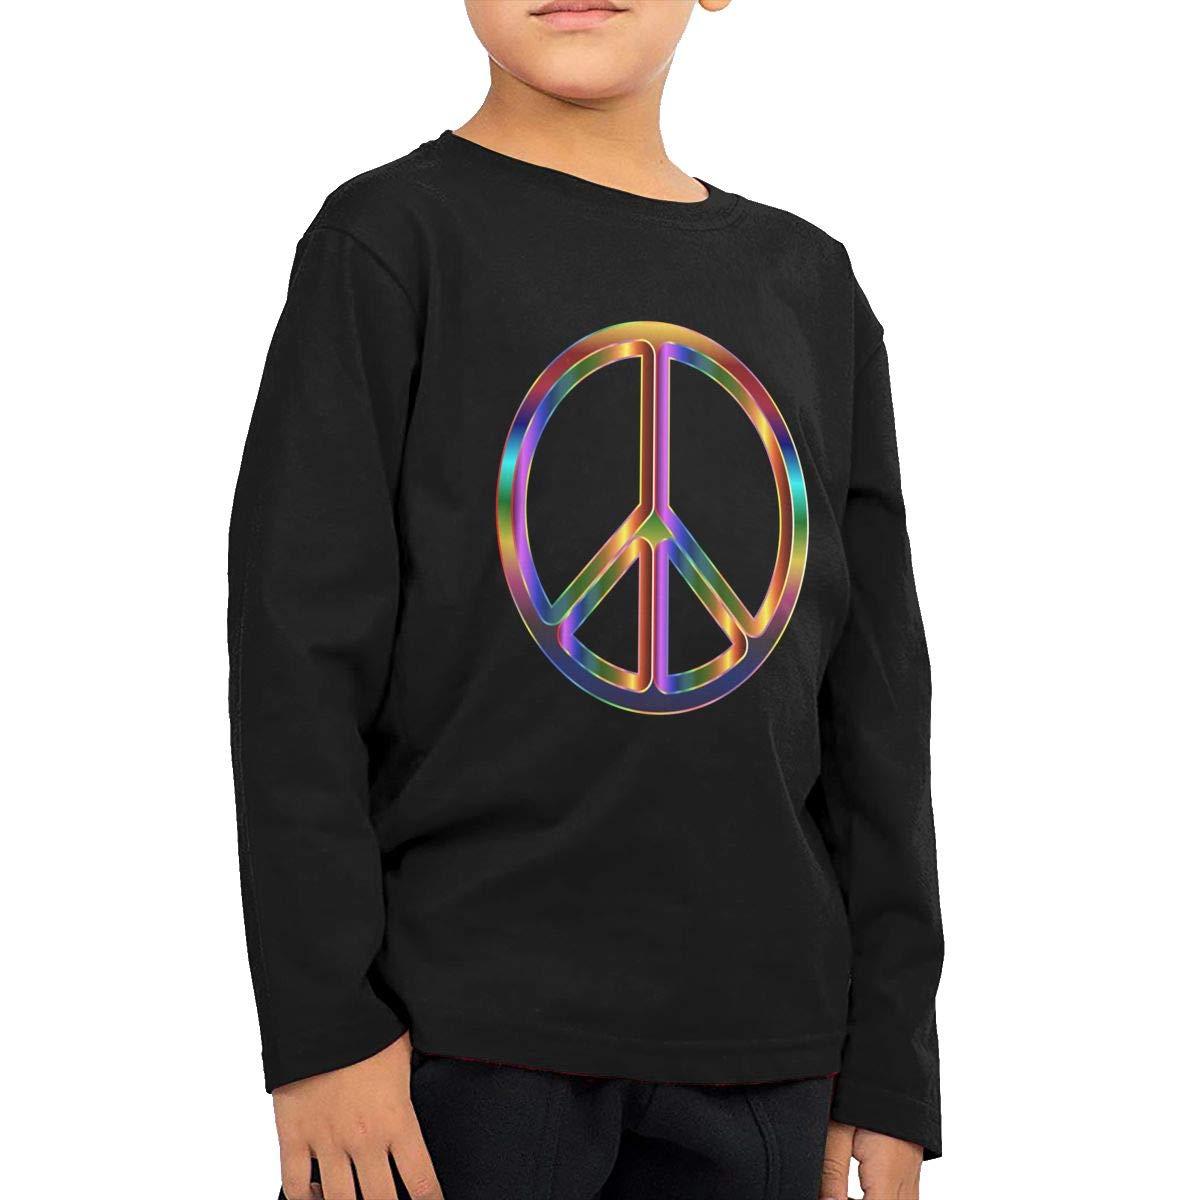 COTDREN Psychedelic Peace Boys Cotton Long Sleeve Tshirt